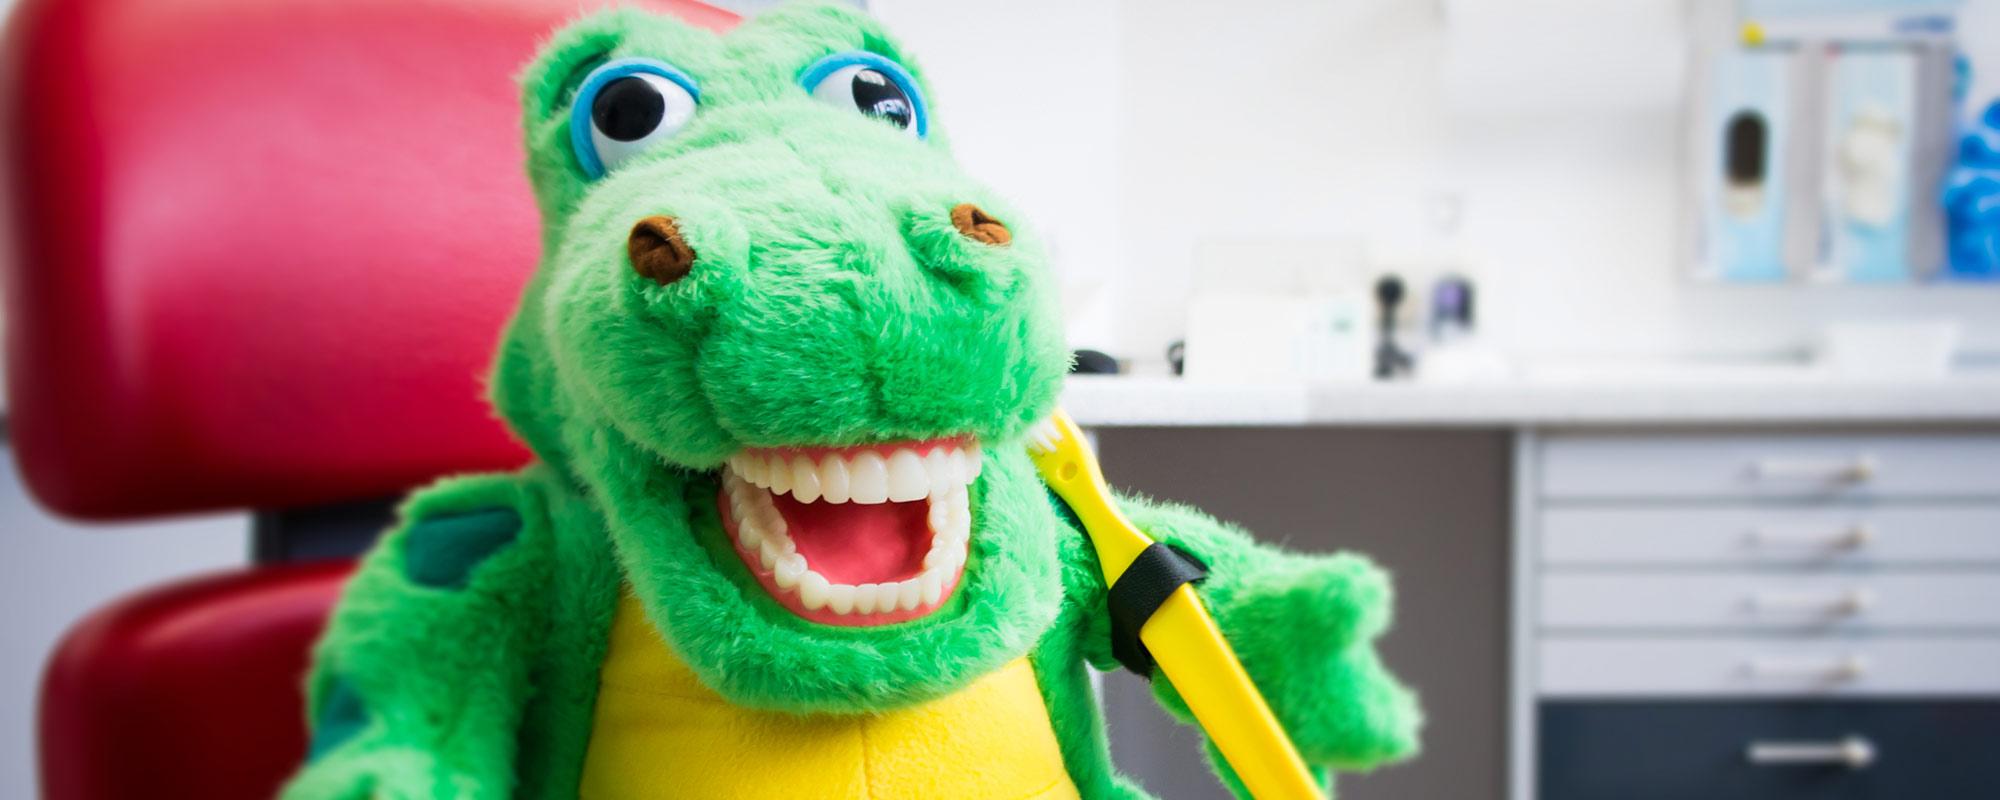 Angstfrei zum Zahnarzt